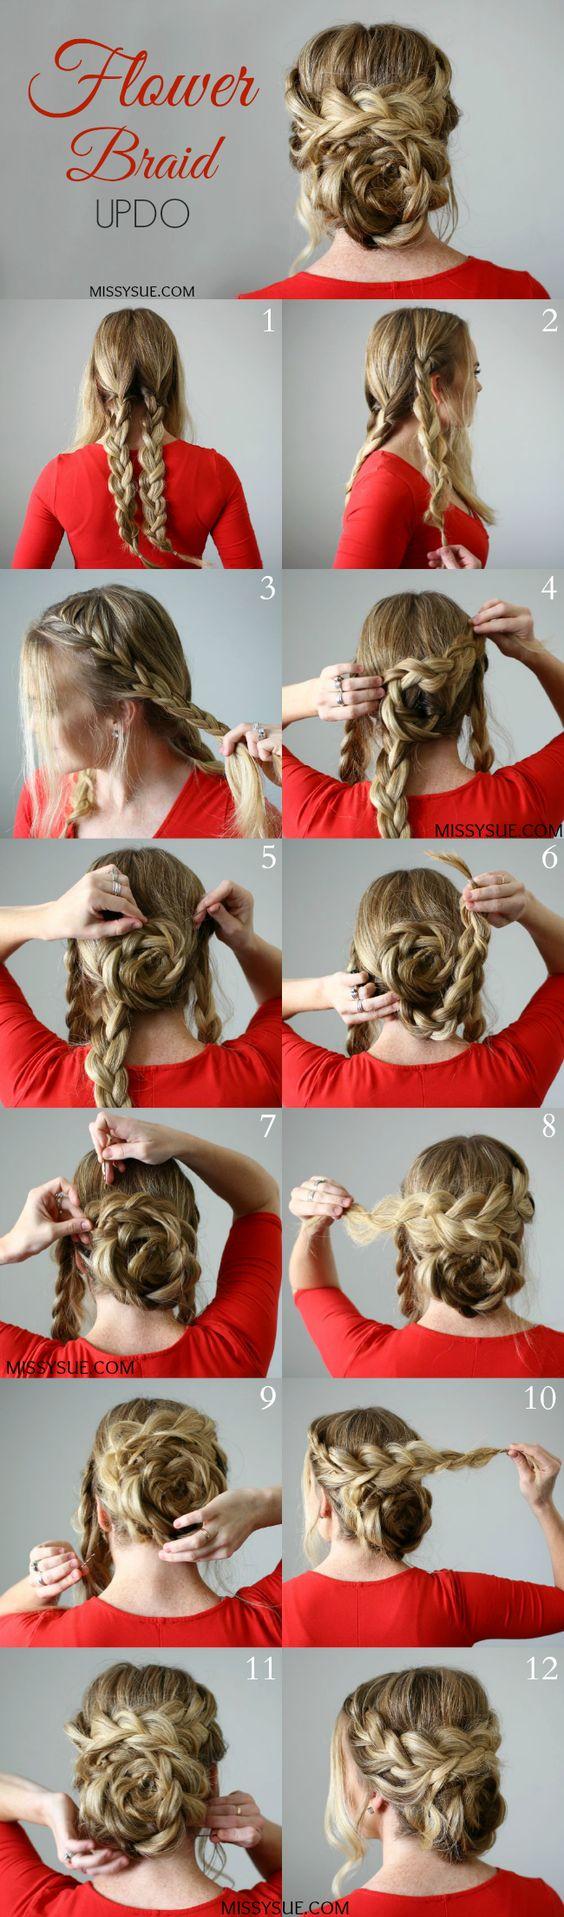 12 Easy Updo Hair Tutorials for the Season - Pretty Designs